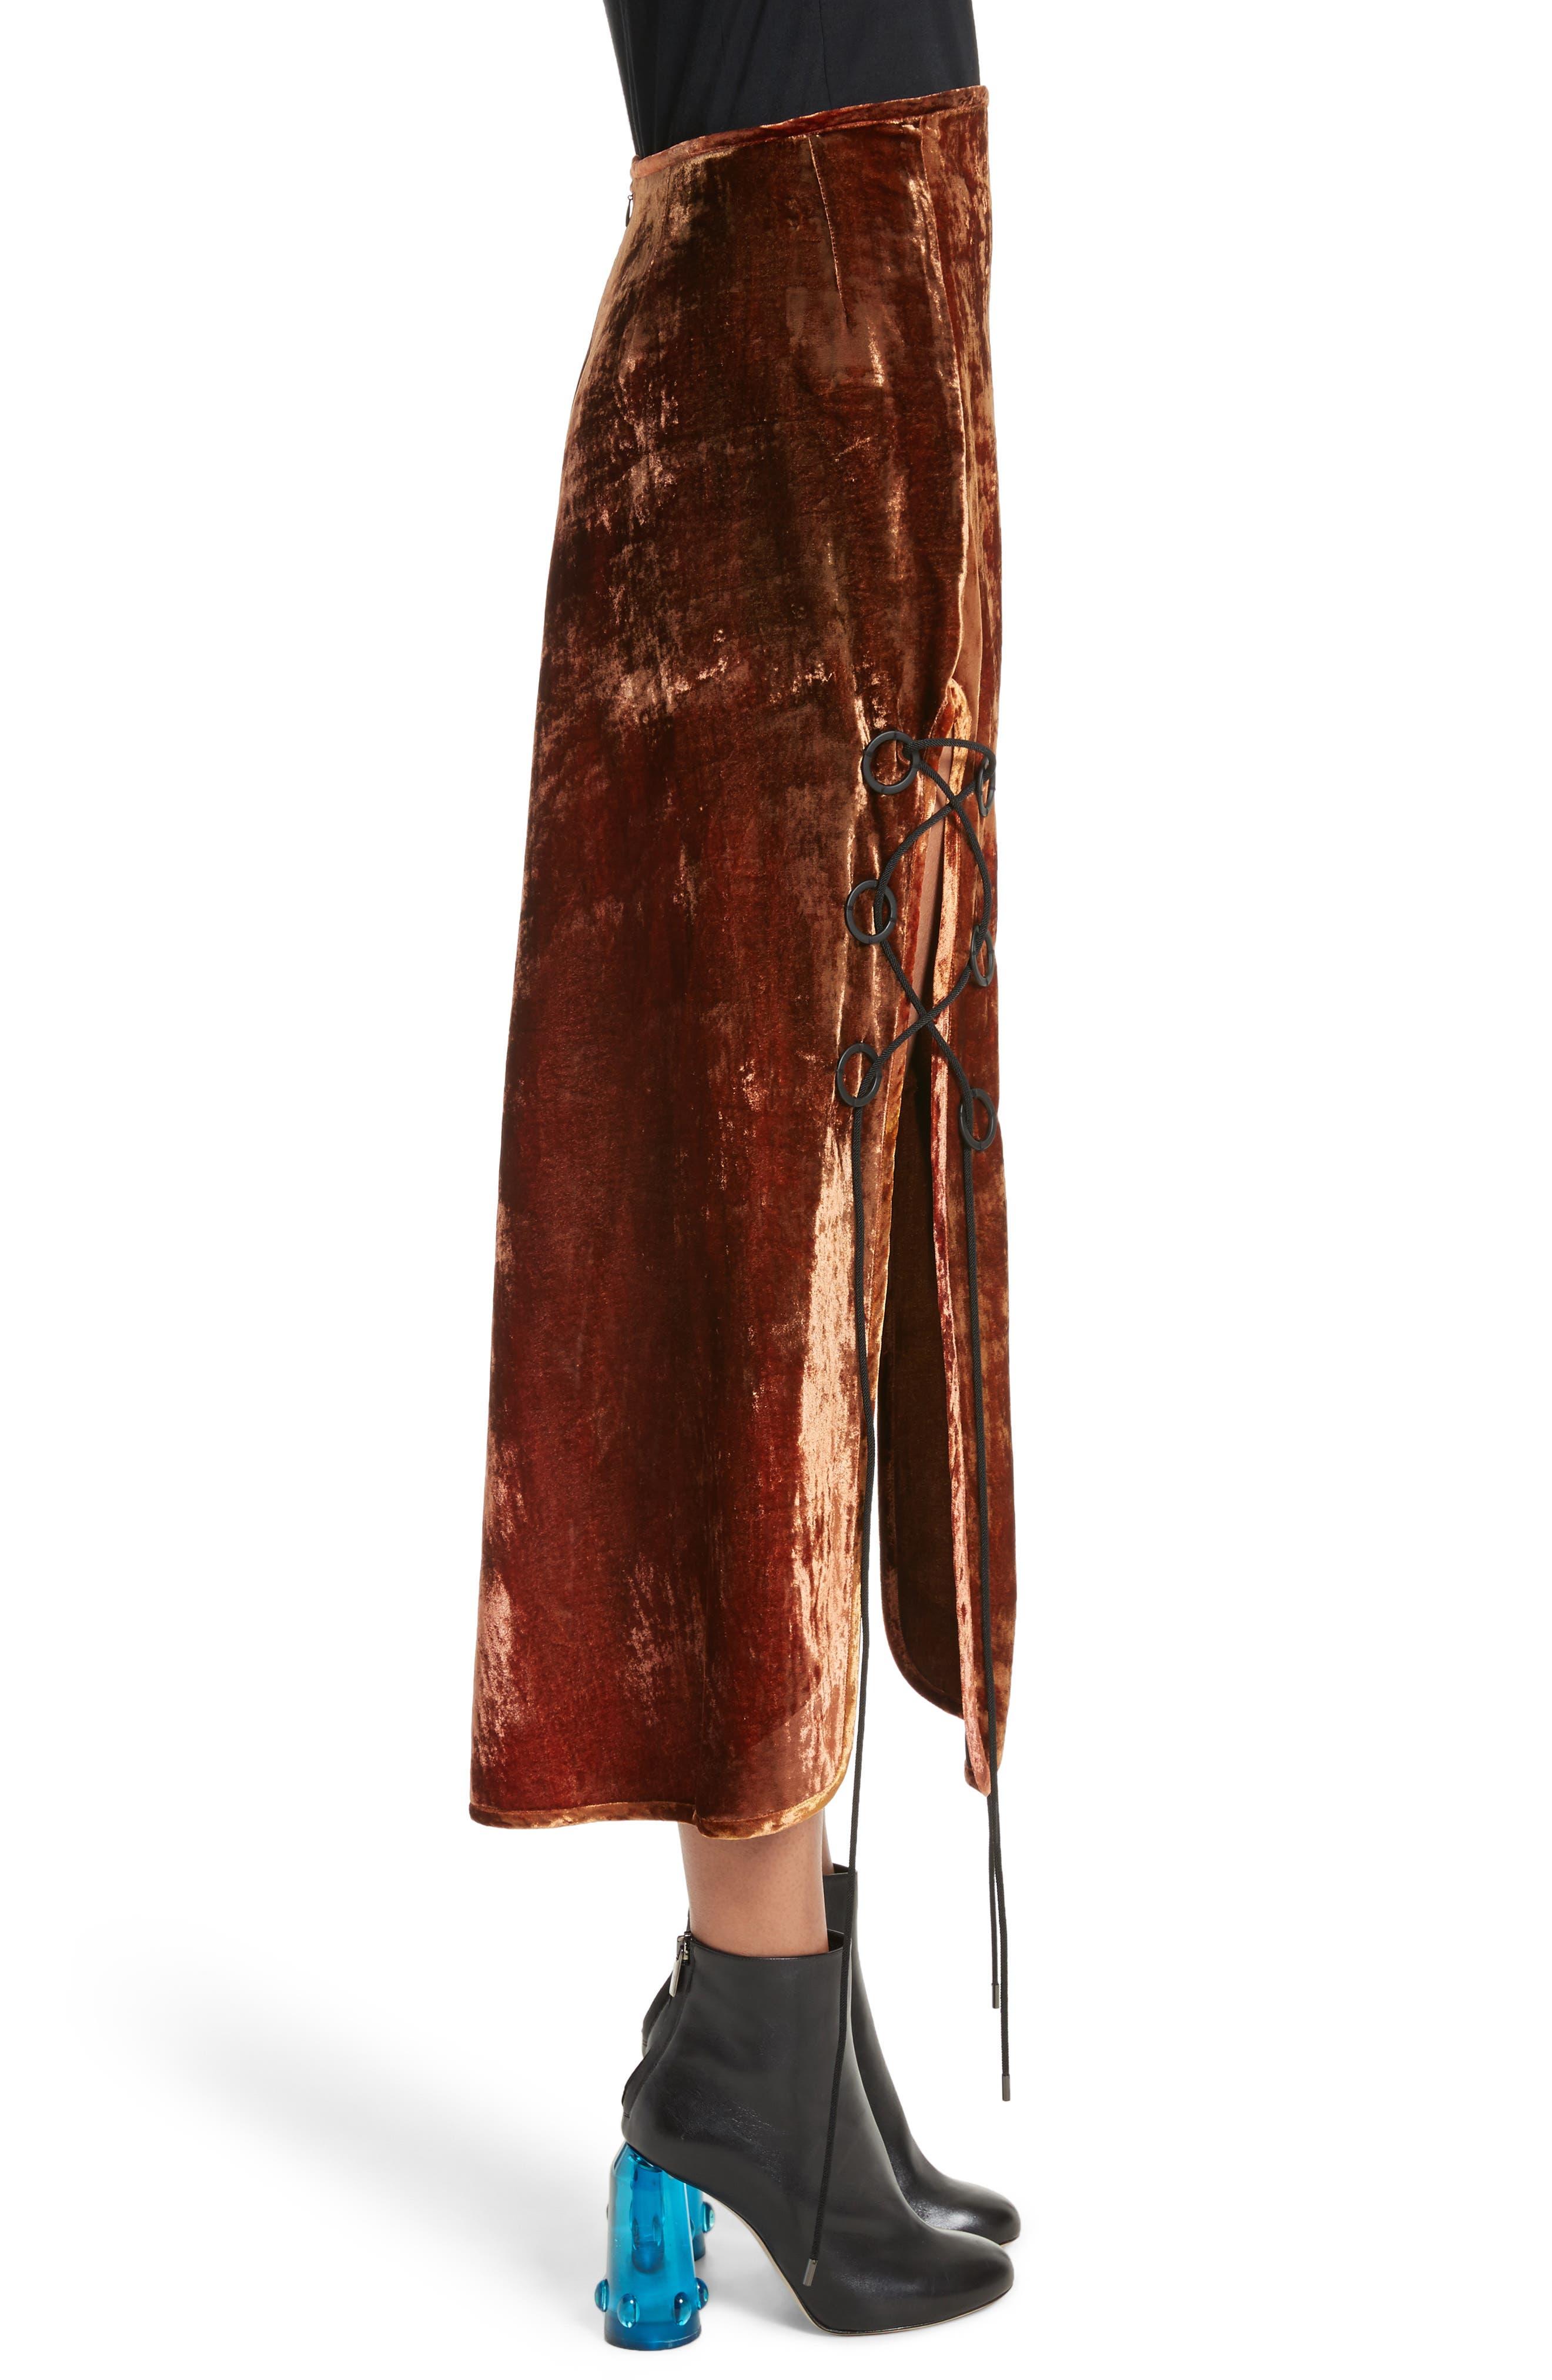 ELLERY, The Blues Lace Up Crushed Velvet Midi Skirt, Alternate thumbnail 3, color, 800